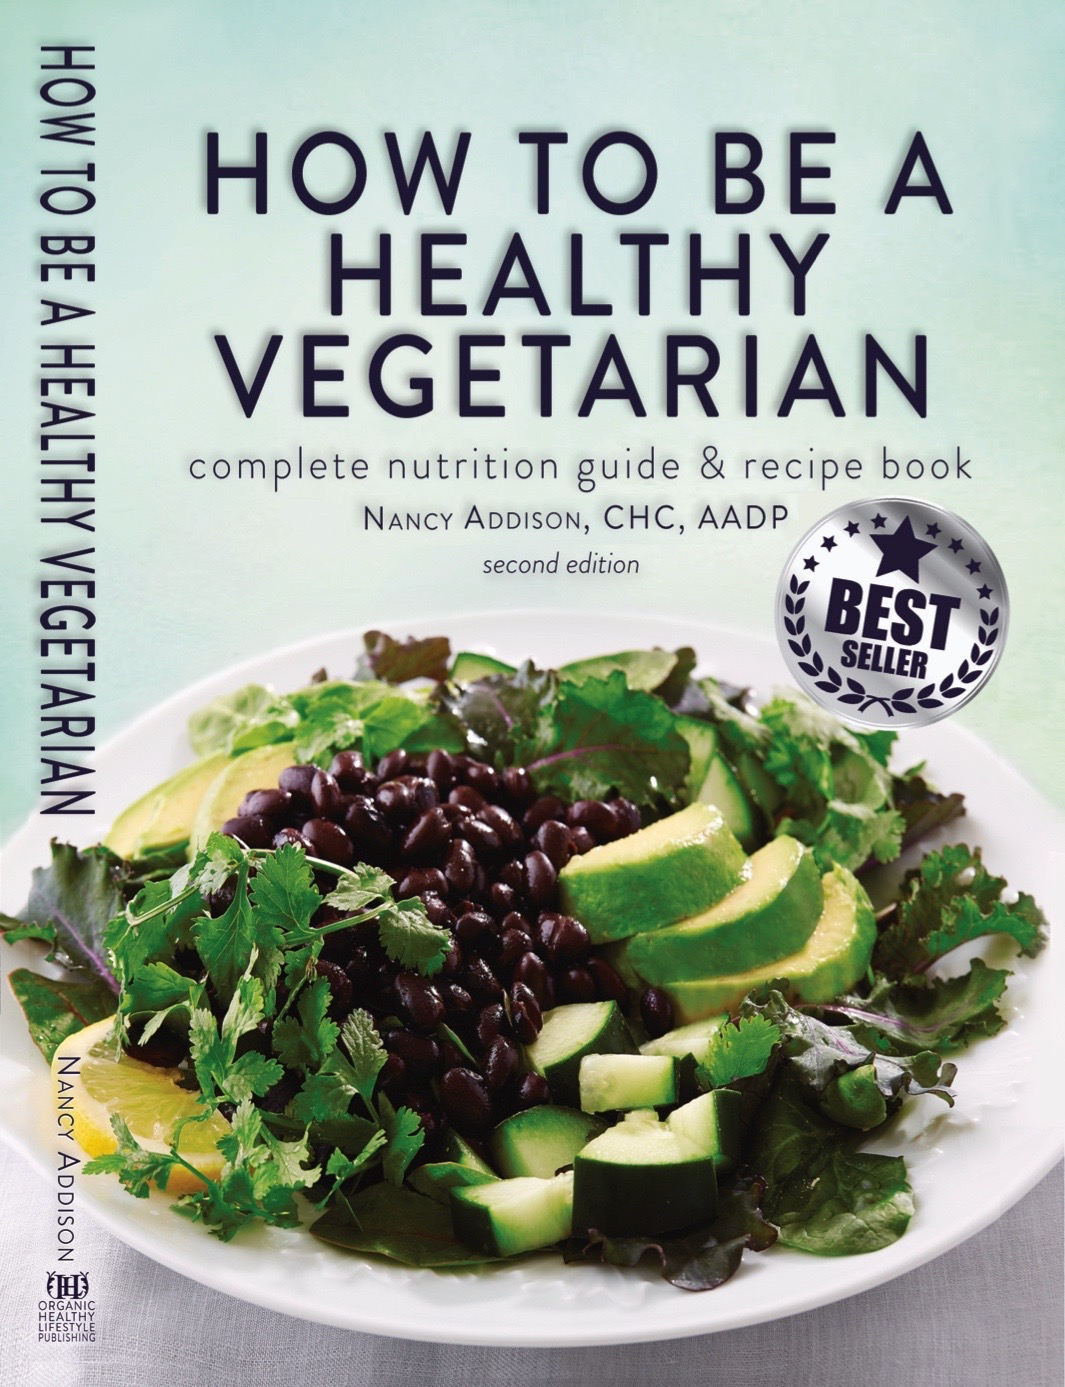 front w spine Healthy-Veg-Cover-Best-Seller-R-FINAL-BSS c